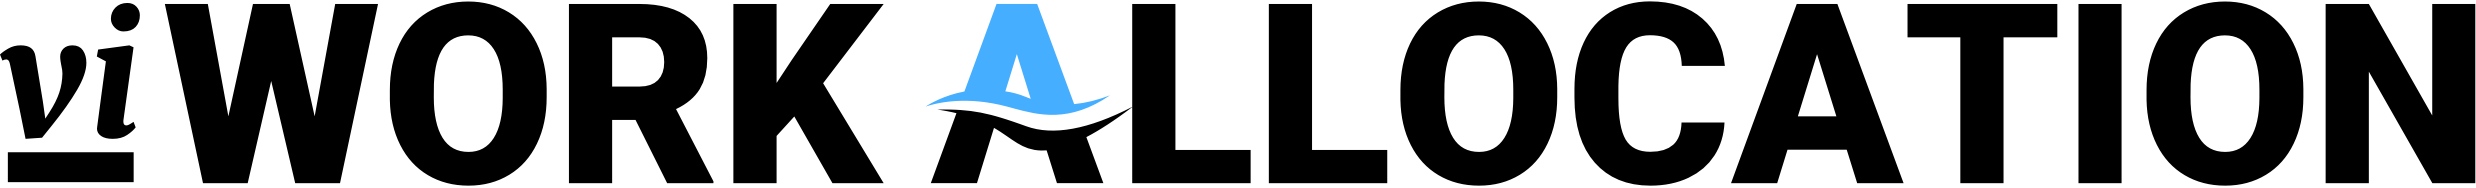 logo-viWORKALLOCATIONwave